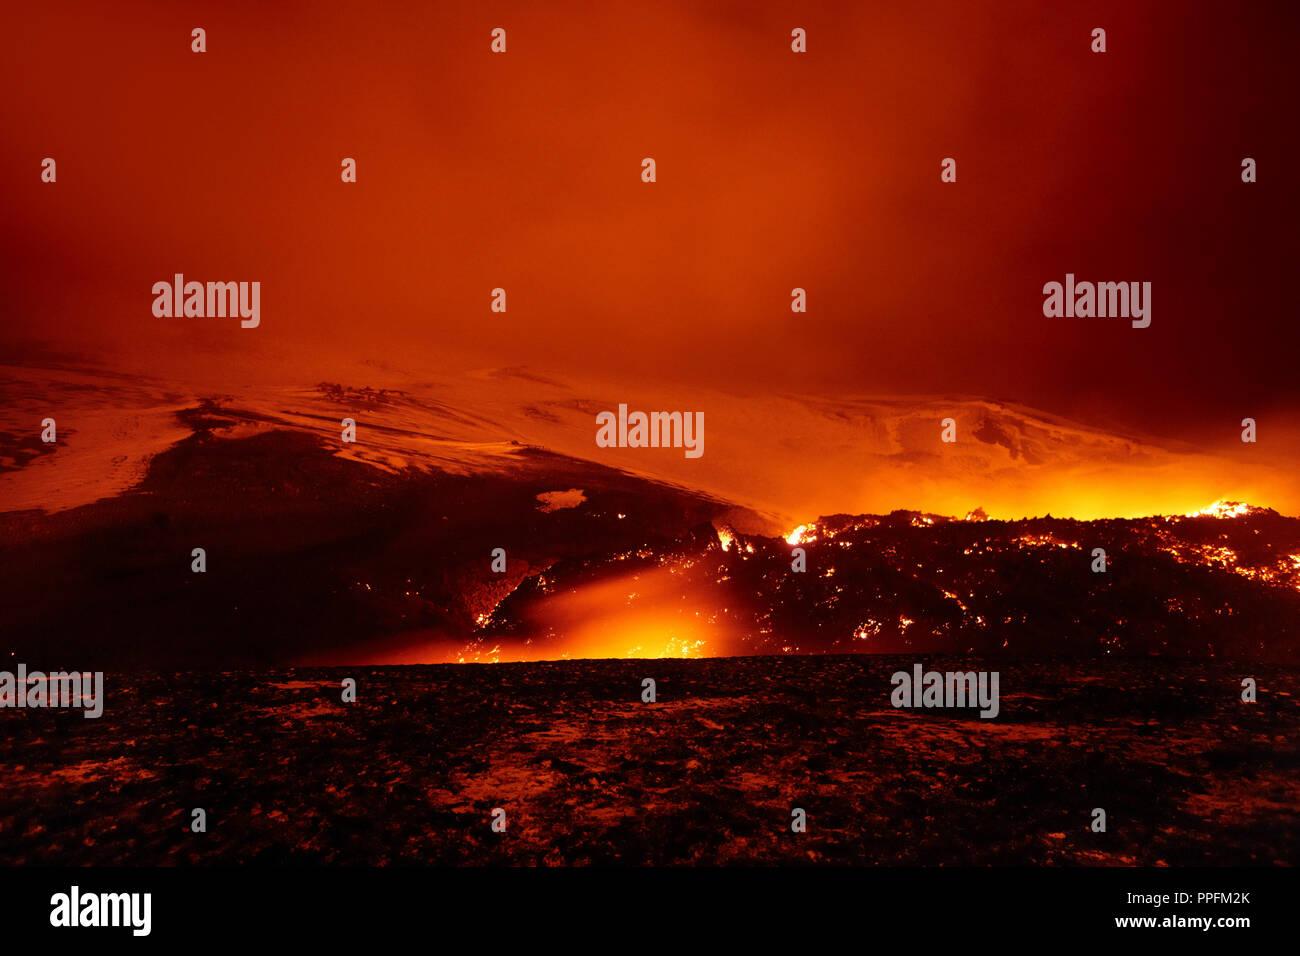 Glowing lava and lava flow at night on Fimmvörðuháls volcano, fissure eruption on Fimmvörduhals - Stock Image